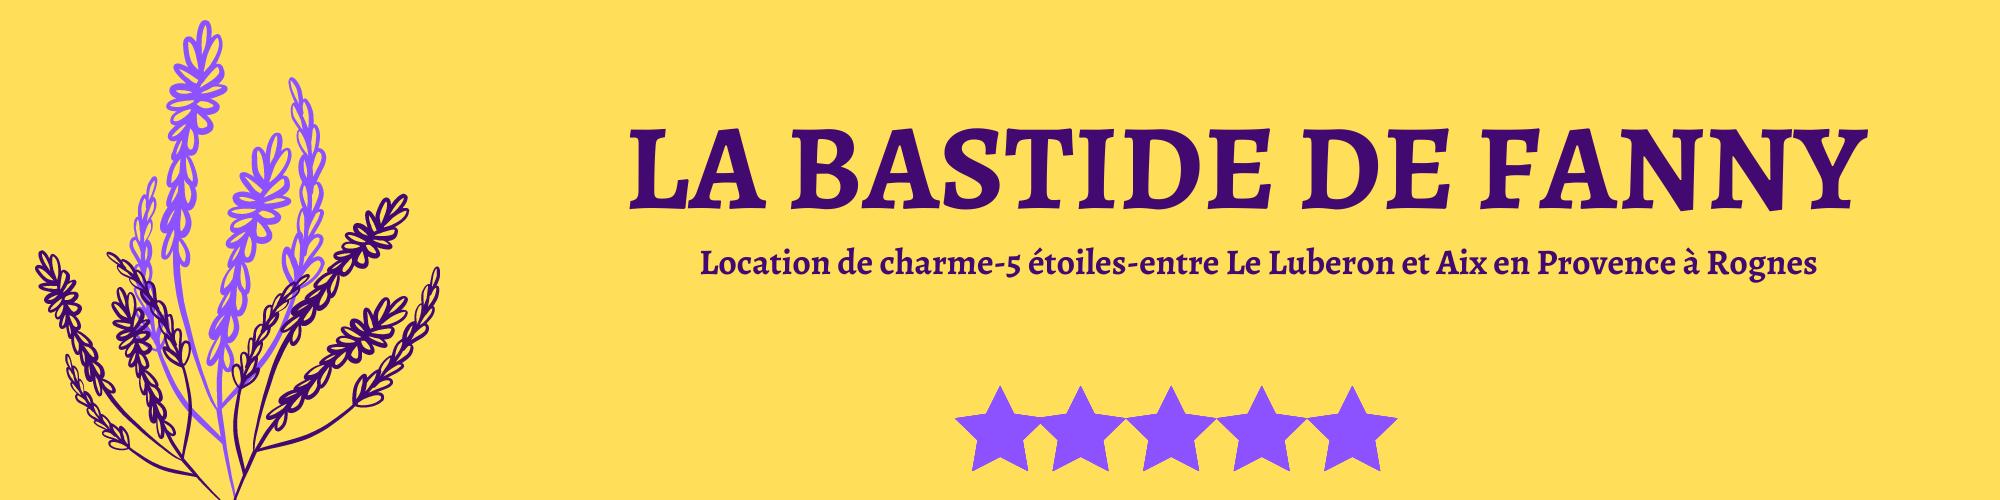 La Bastide de Fanny